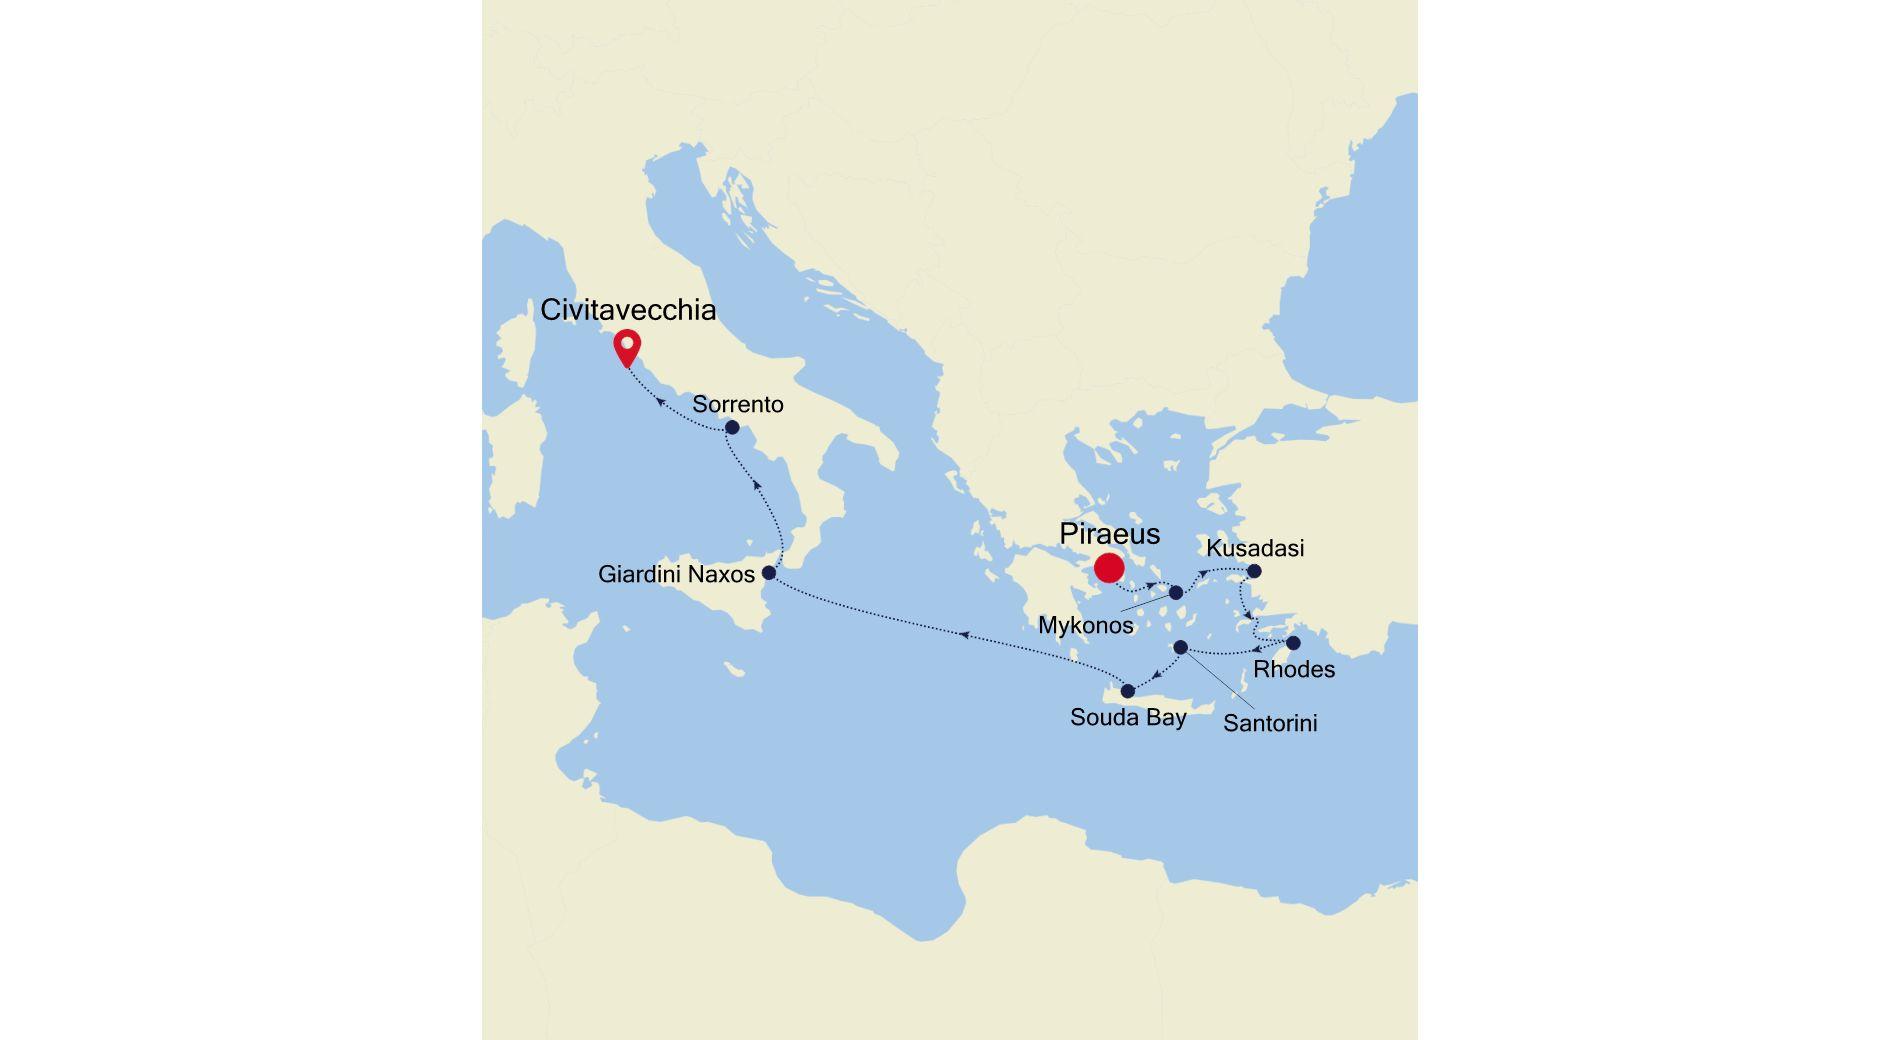 SL210425010 - Piraeus to Civitavecchia